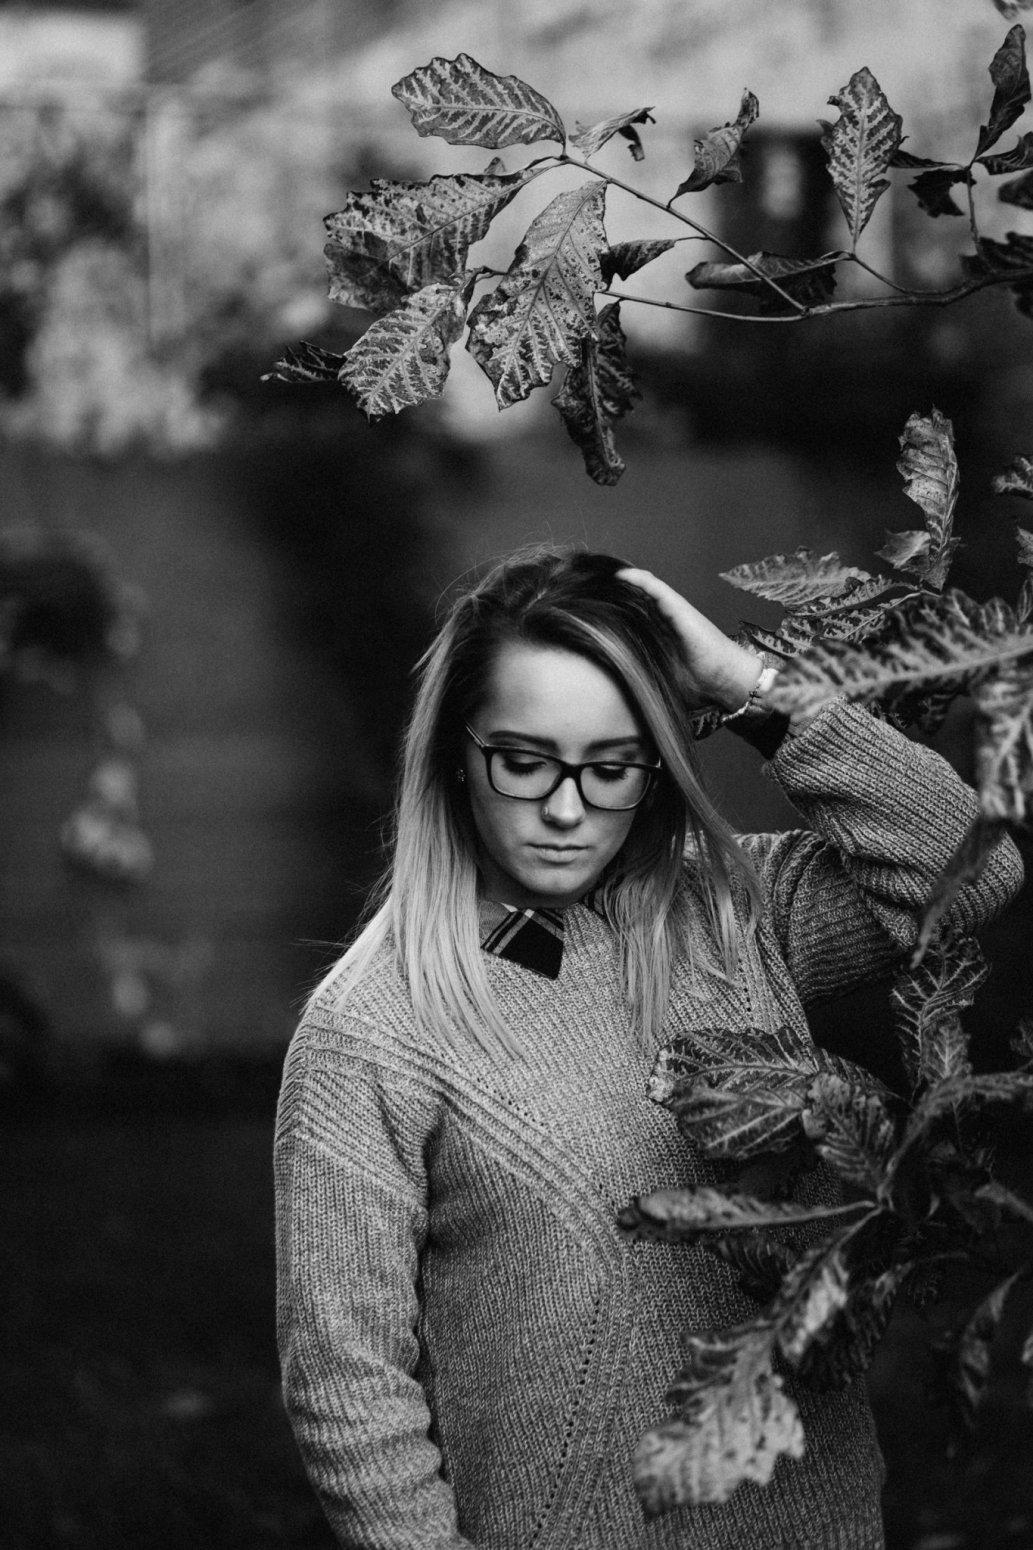 wild-native-photography-pittsburgh-senior-portrait-photographer-erin-oglebay_1562